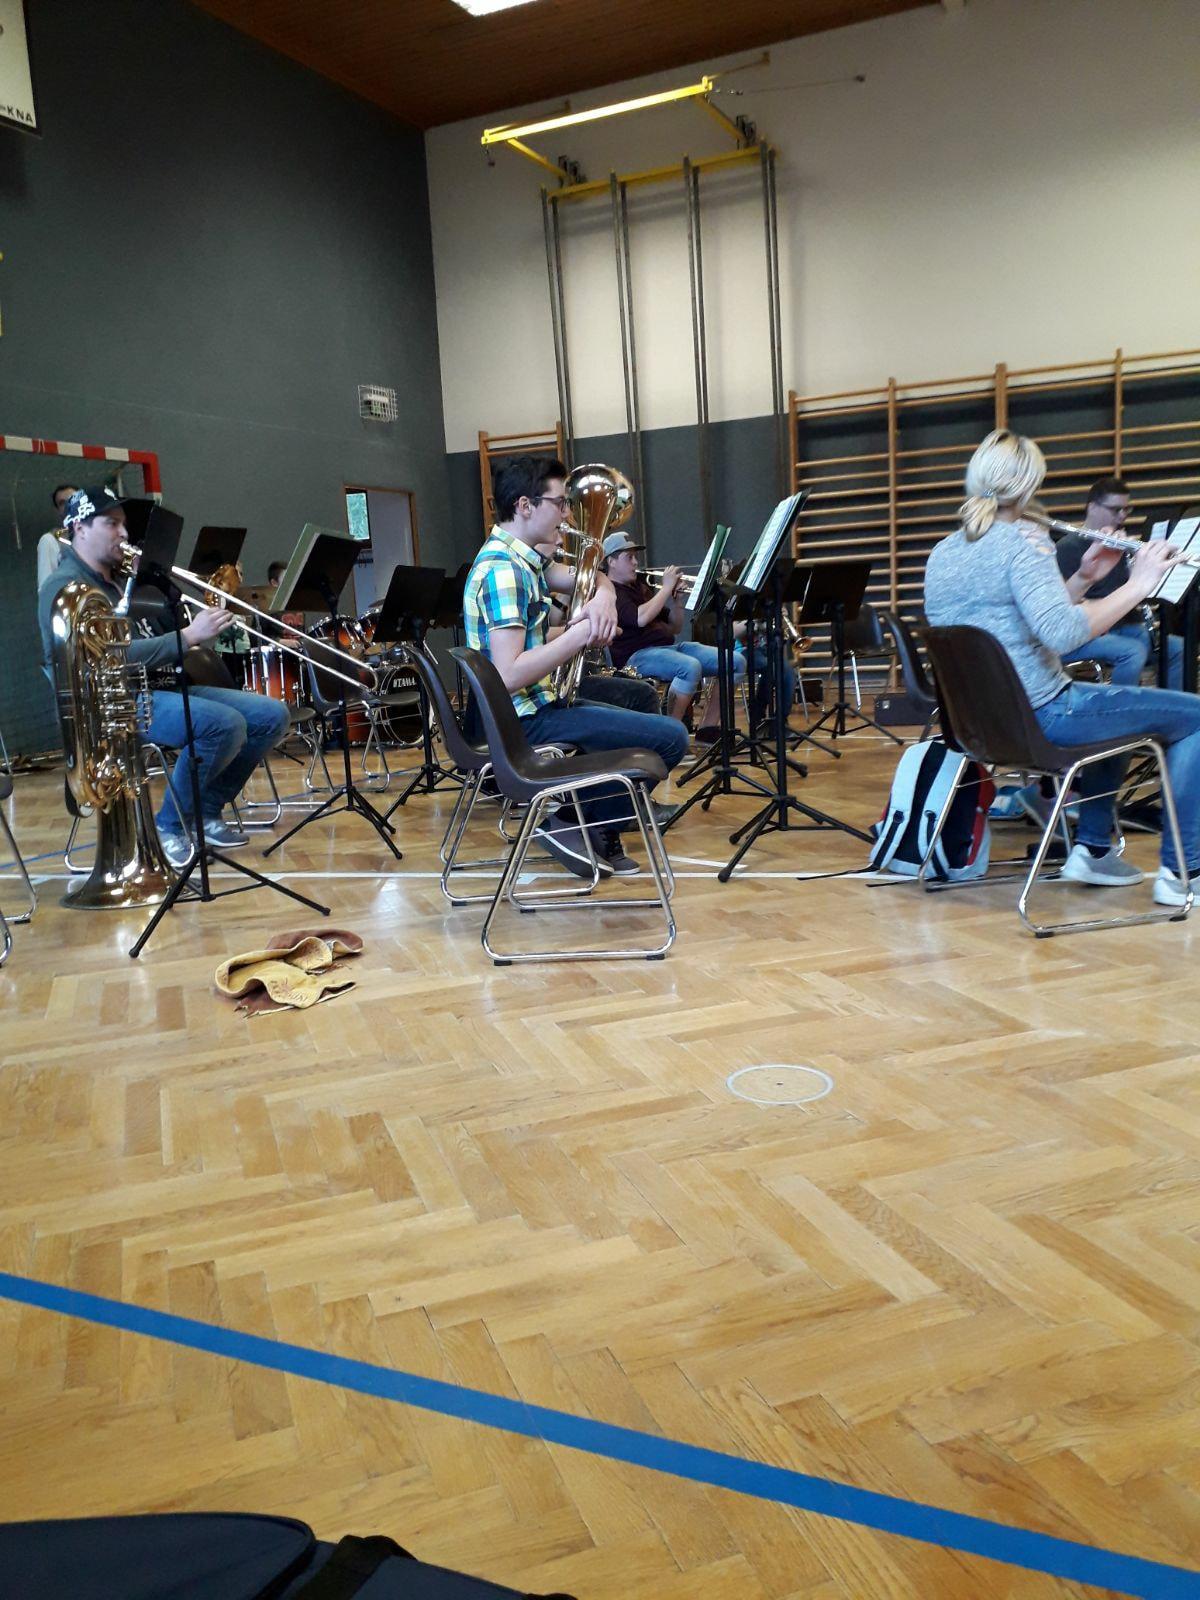 Jungmusikerprobe am Samstag